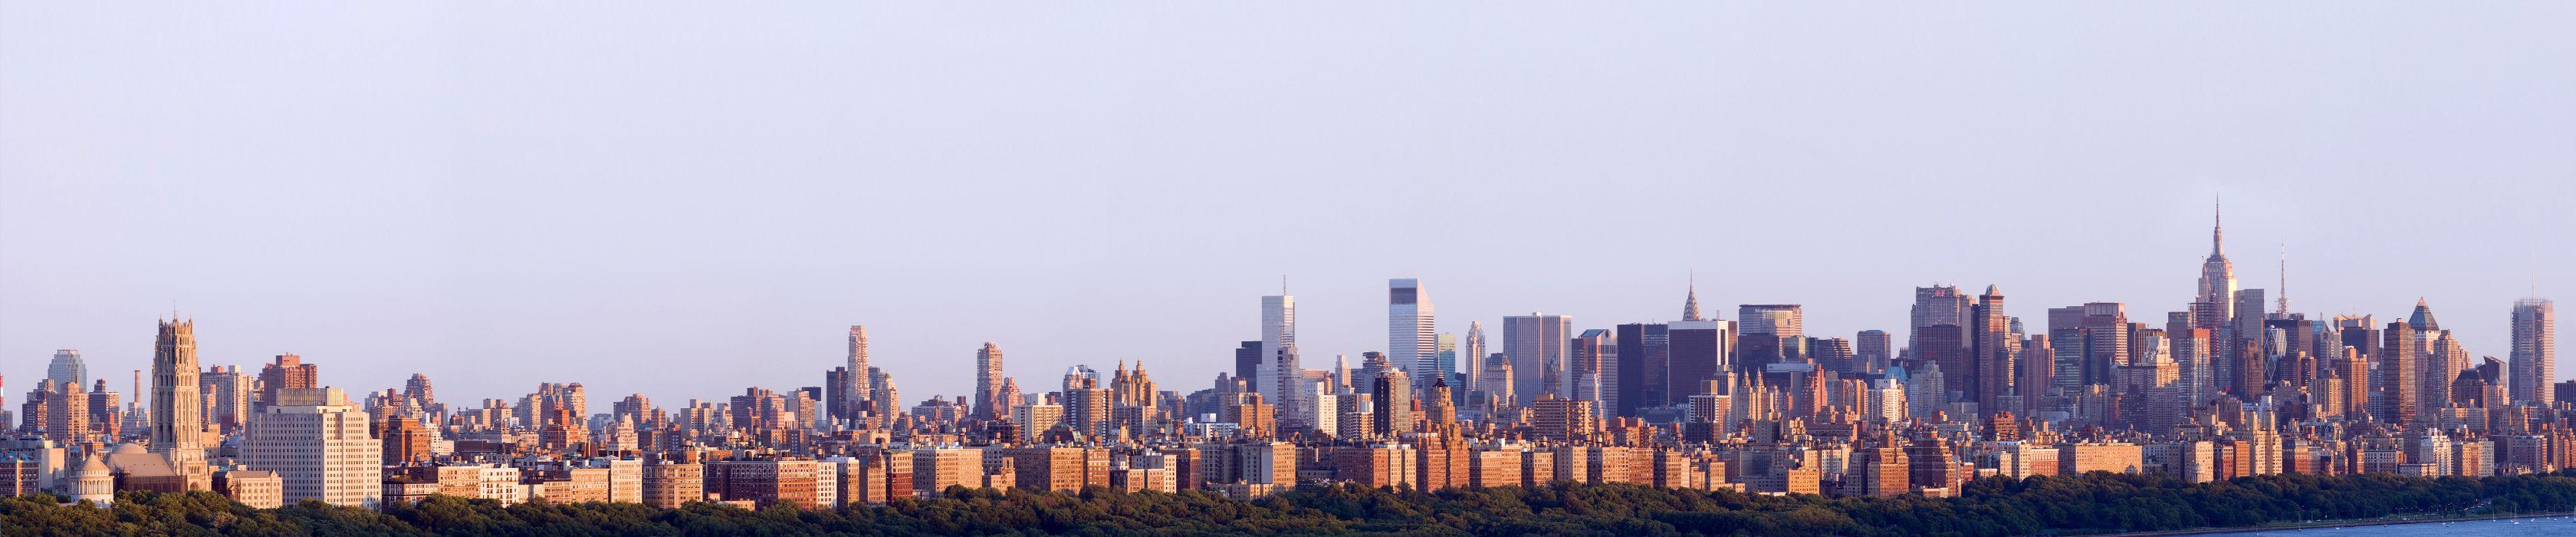 New York City   h wallpaper